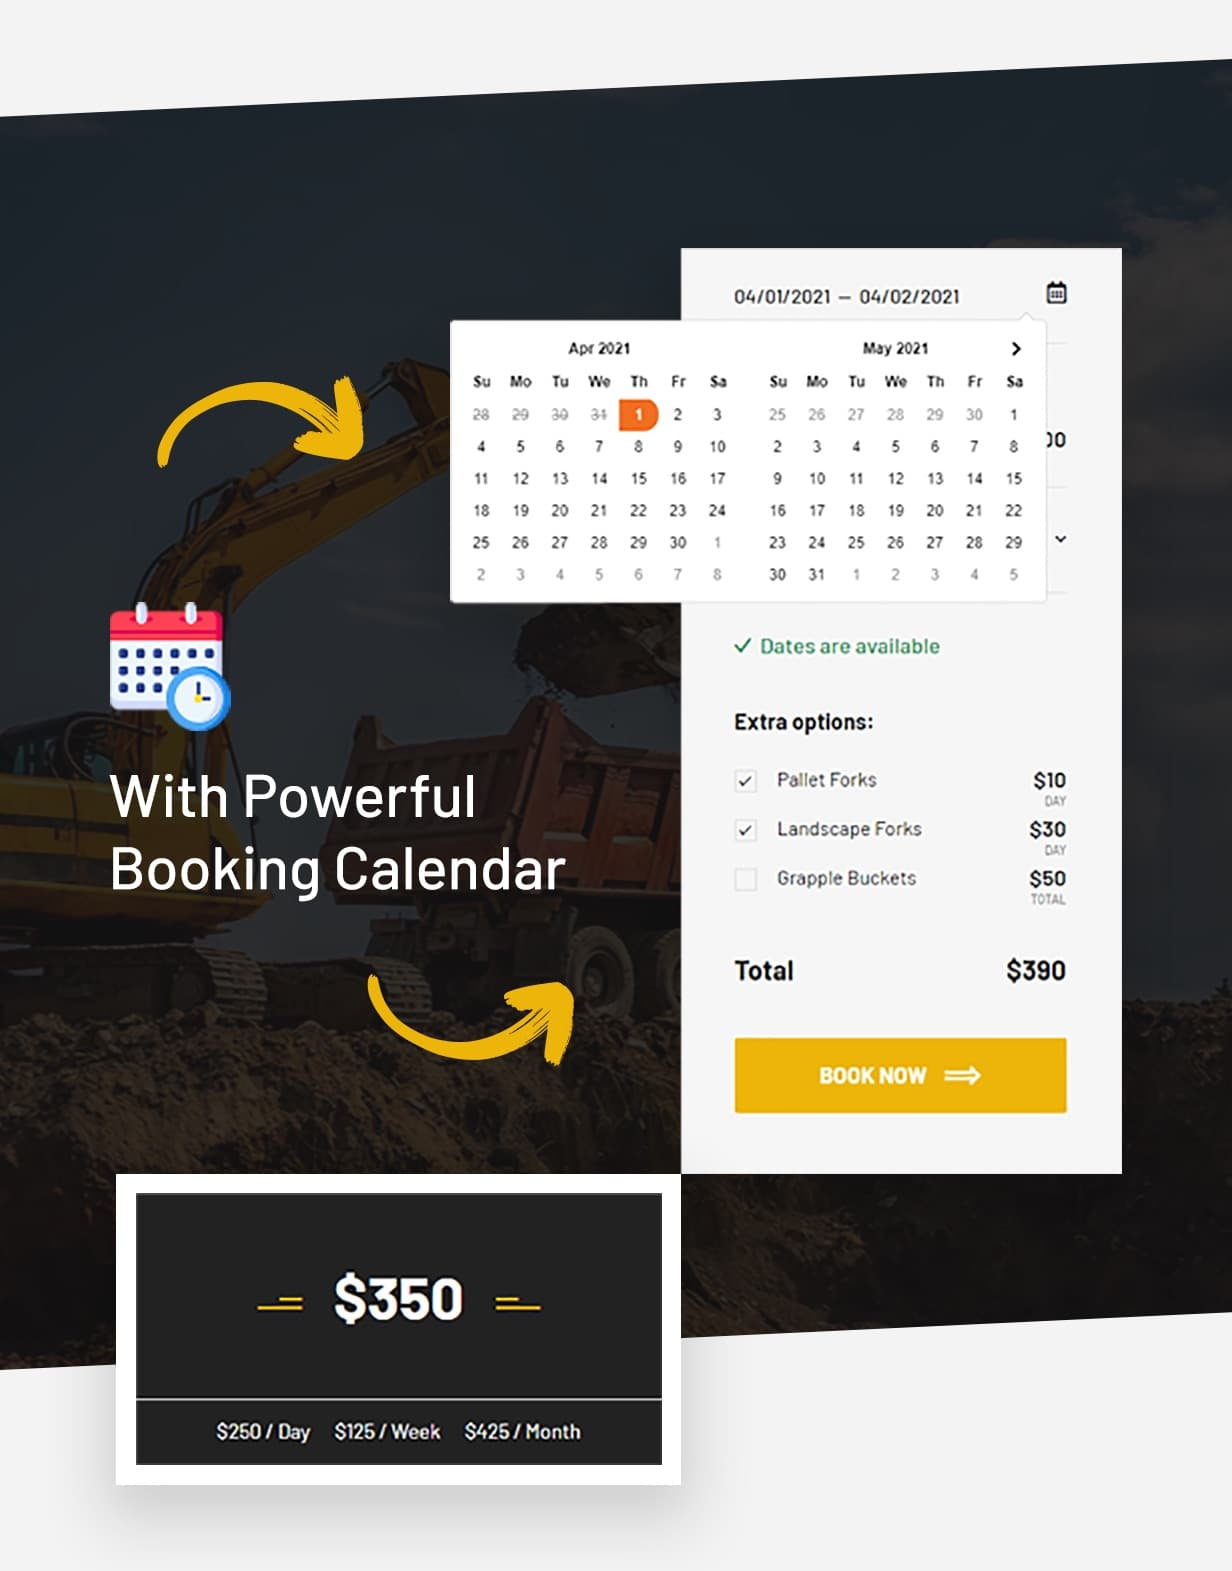 Antek - Powerful Booking Calendar